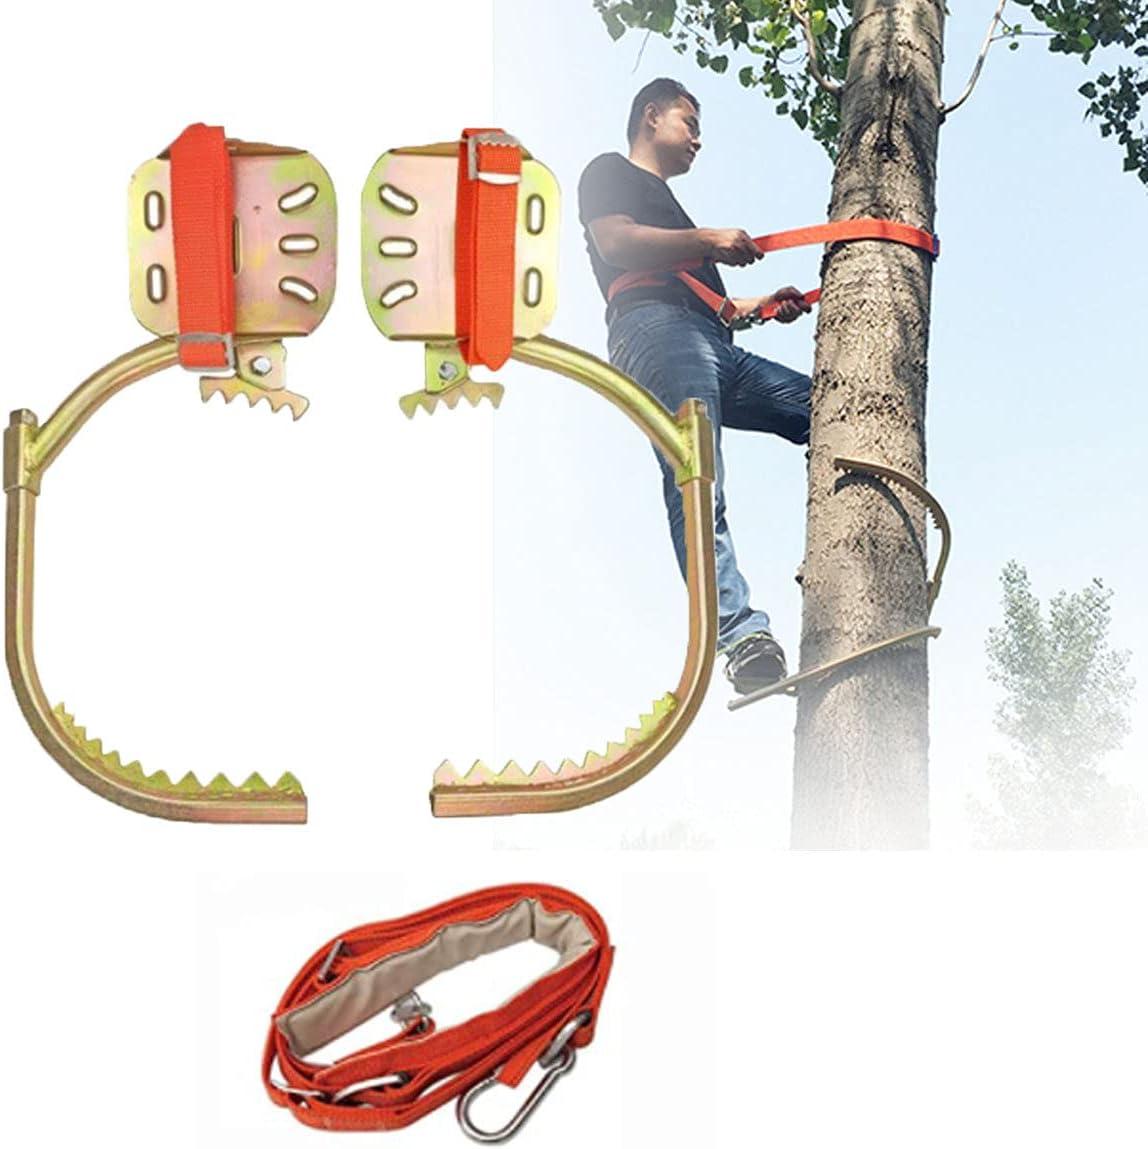 WZFANJIJ Tree Climbing Portland Mall Spike Set Tulsa Mall Equipment Non-S